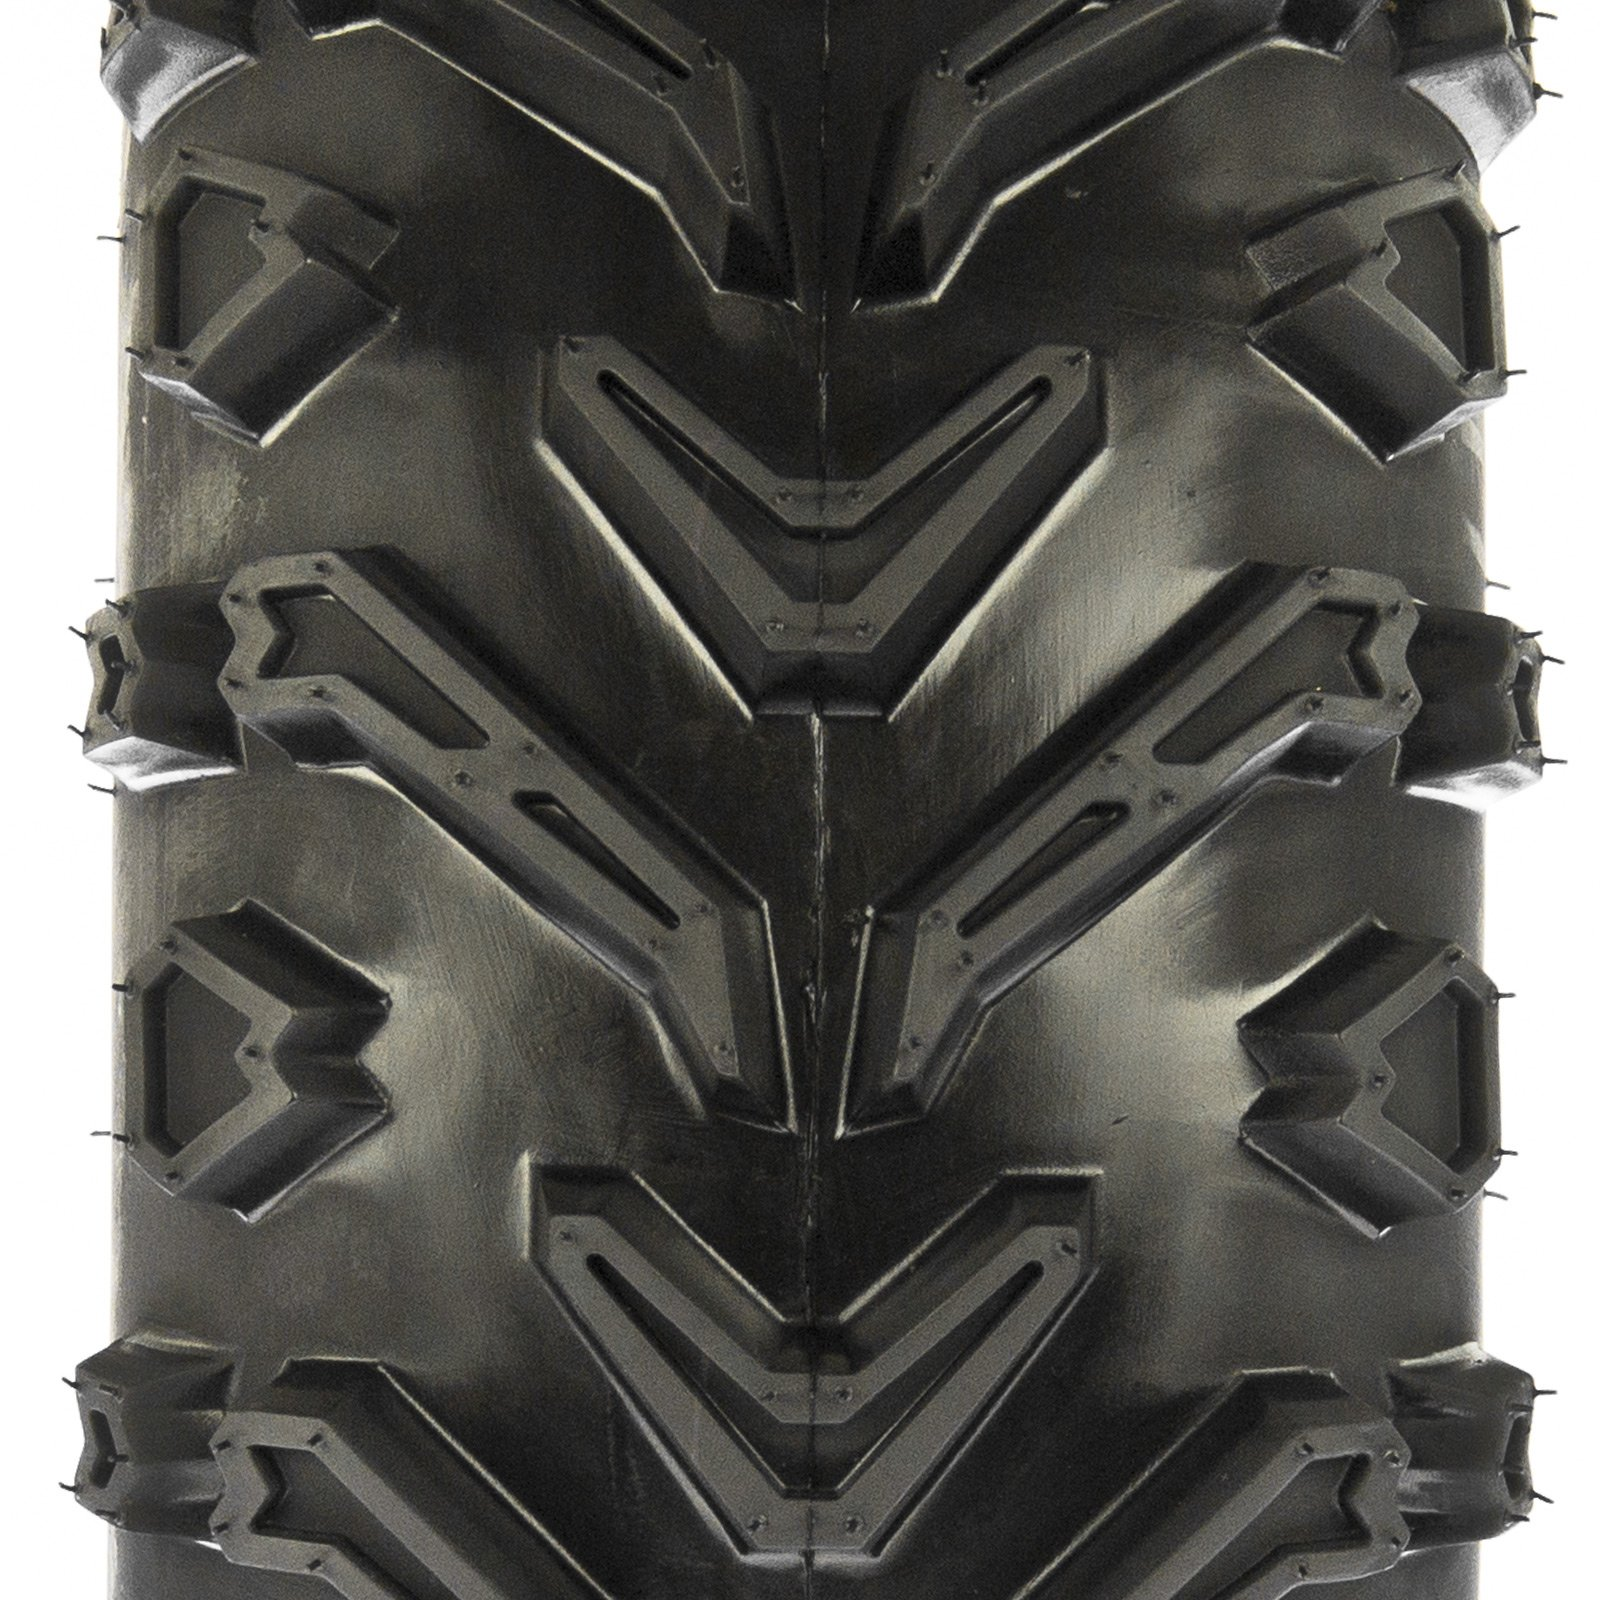 SunF All Trail & Mud ATV UTV Tires 24x8-12 24x10-11 6 PR A041 (Complete Full Set of 4) by SunF (Image #5)